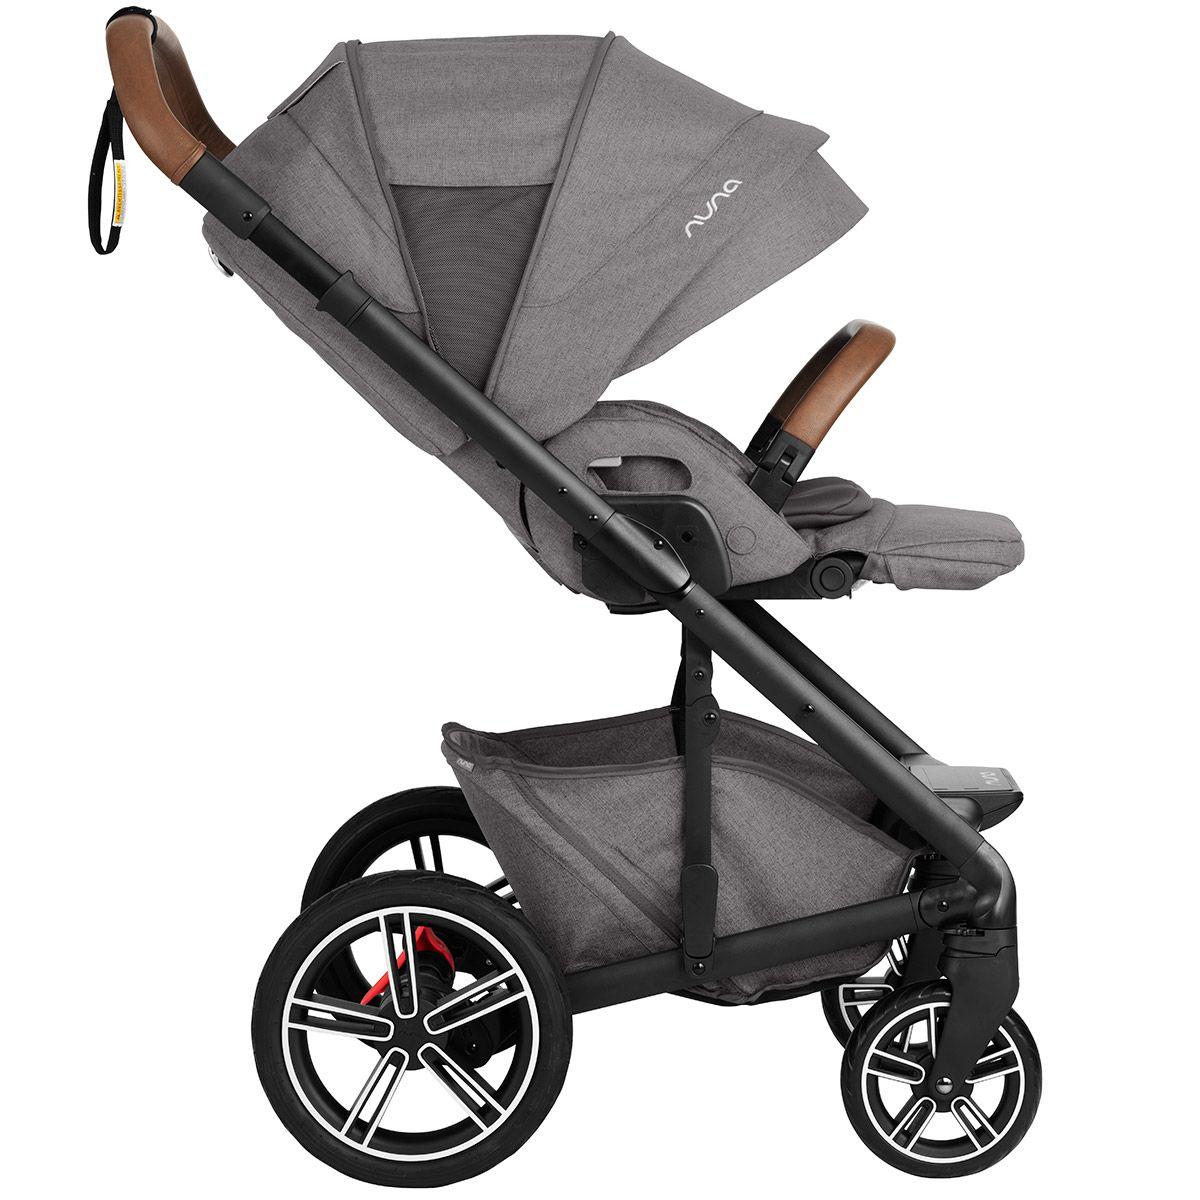 Mixx stroller with images nuna mixx stroller stroller